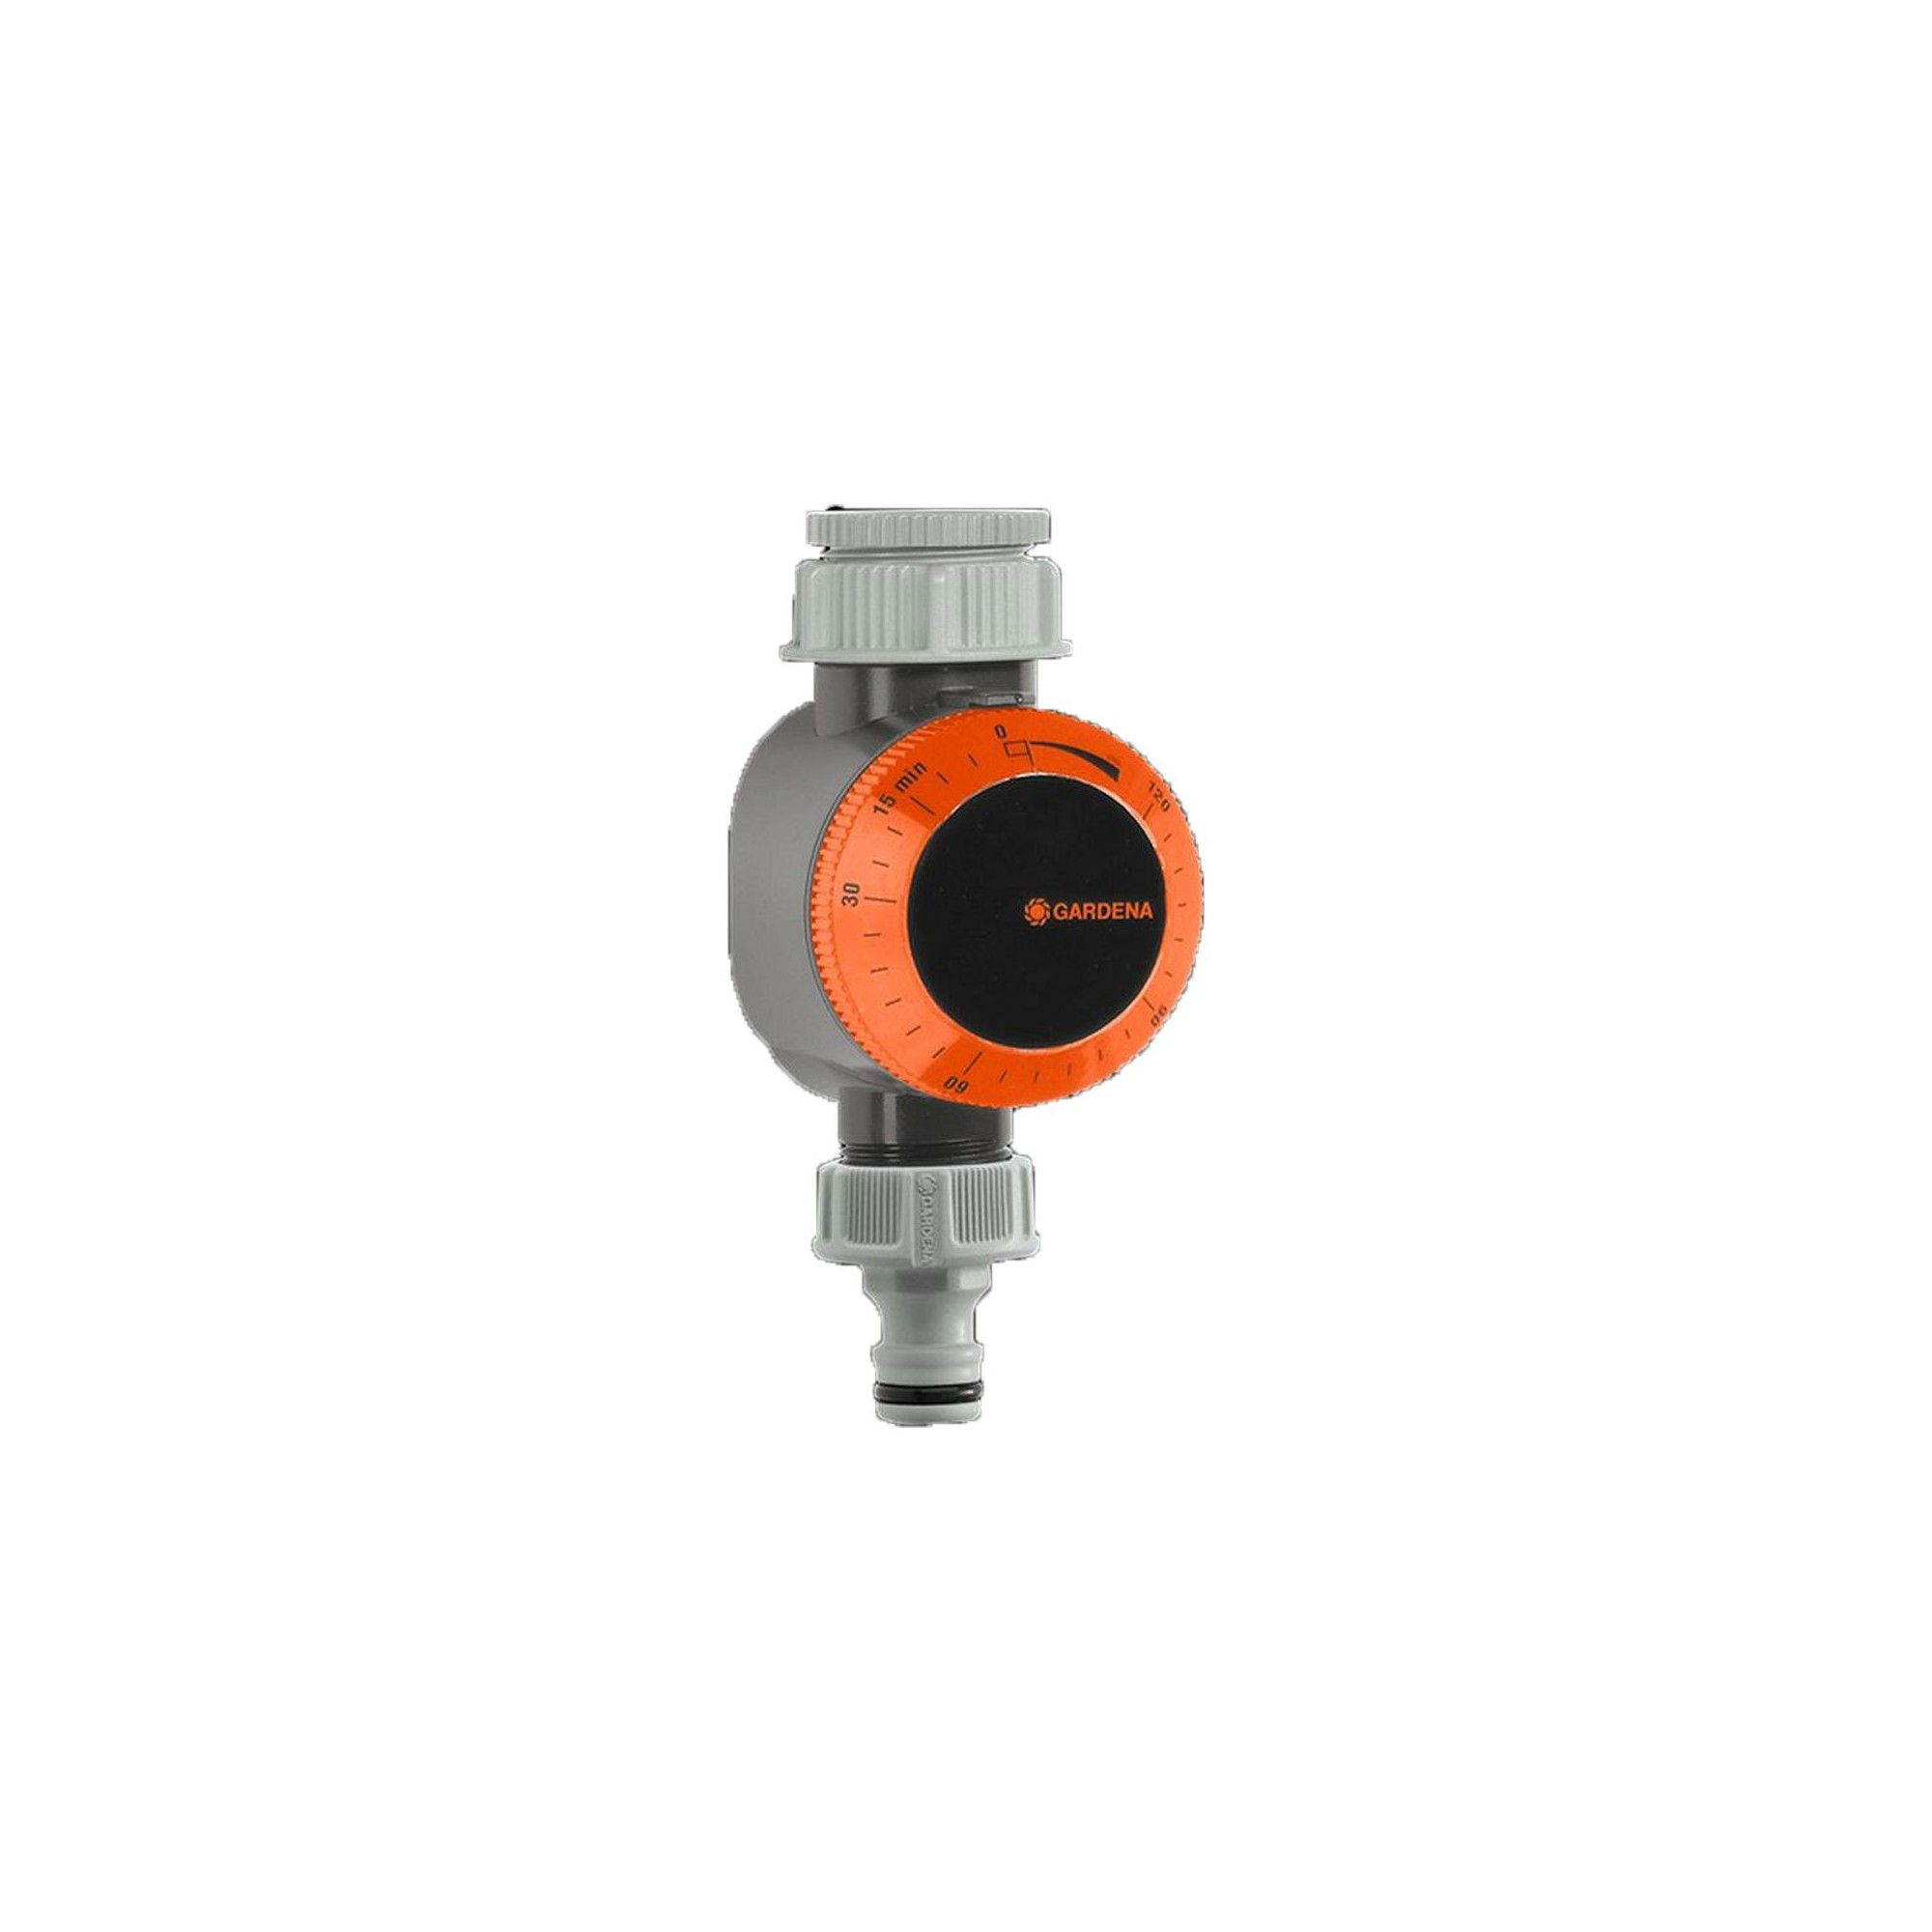 Gardena 31169 Quick Connect Mechanical Garden Water Timer With Flow Control In 2019 Water Timer Water Garden Sprinkler